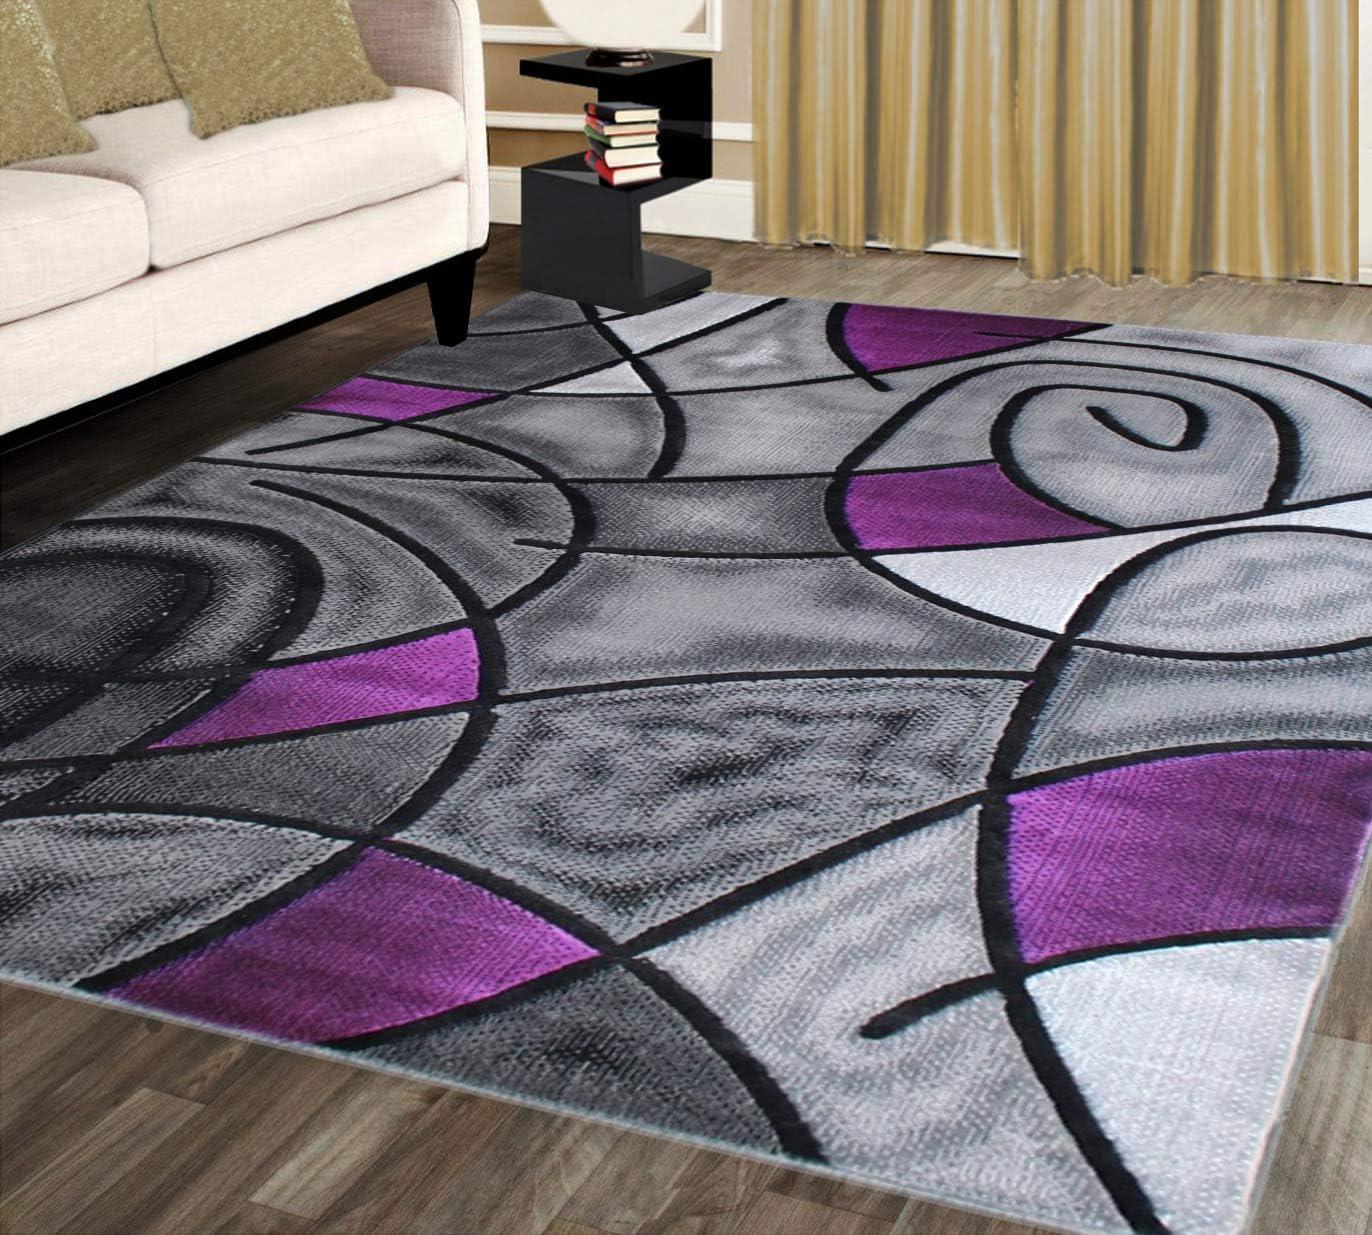 Masada Rugs, Modern Contemporary Area Rug, Purple Grey Black 5 Feet X 7 Feet